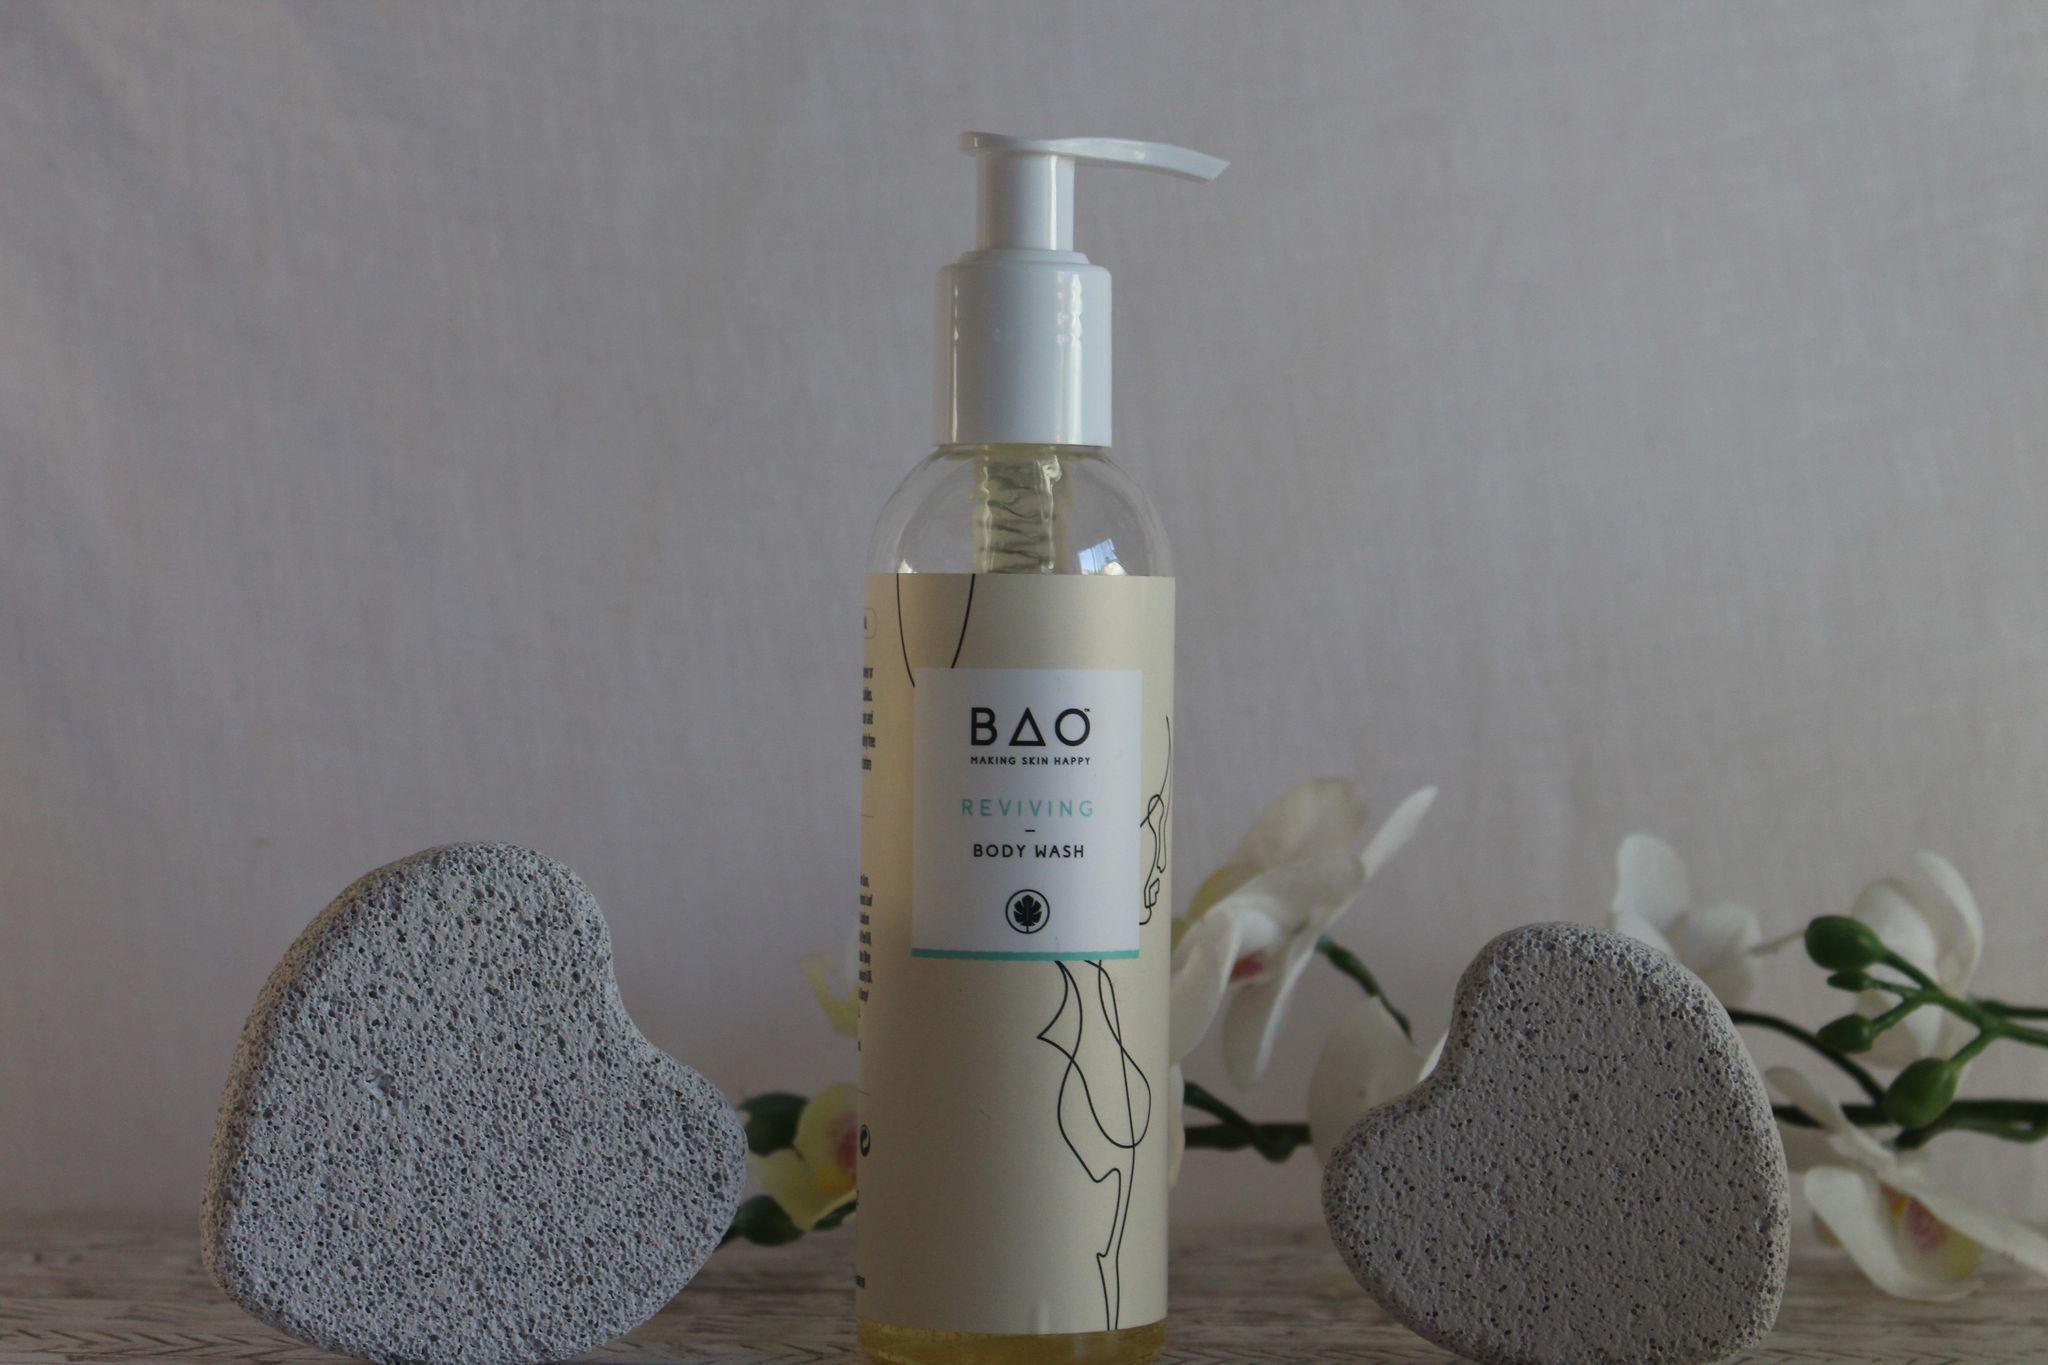 BAO Reviving body wash review